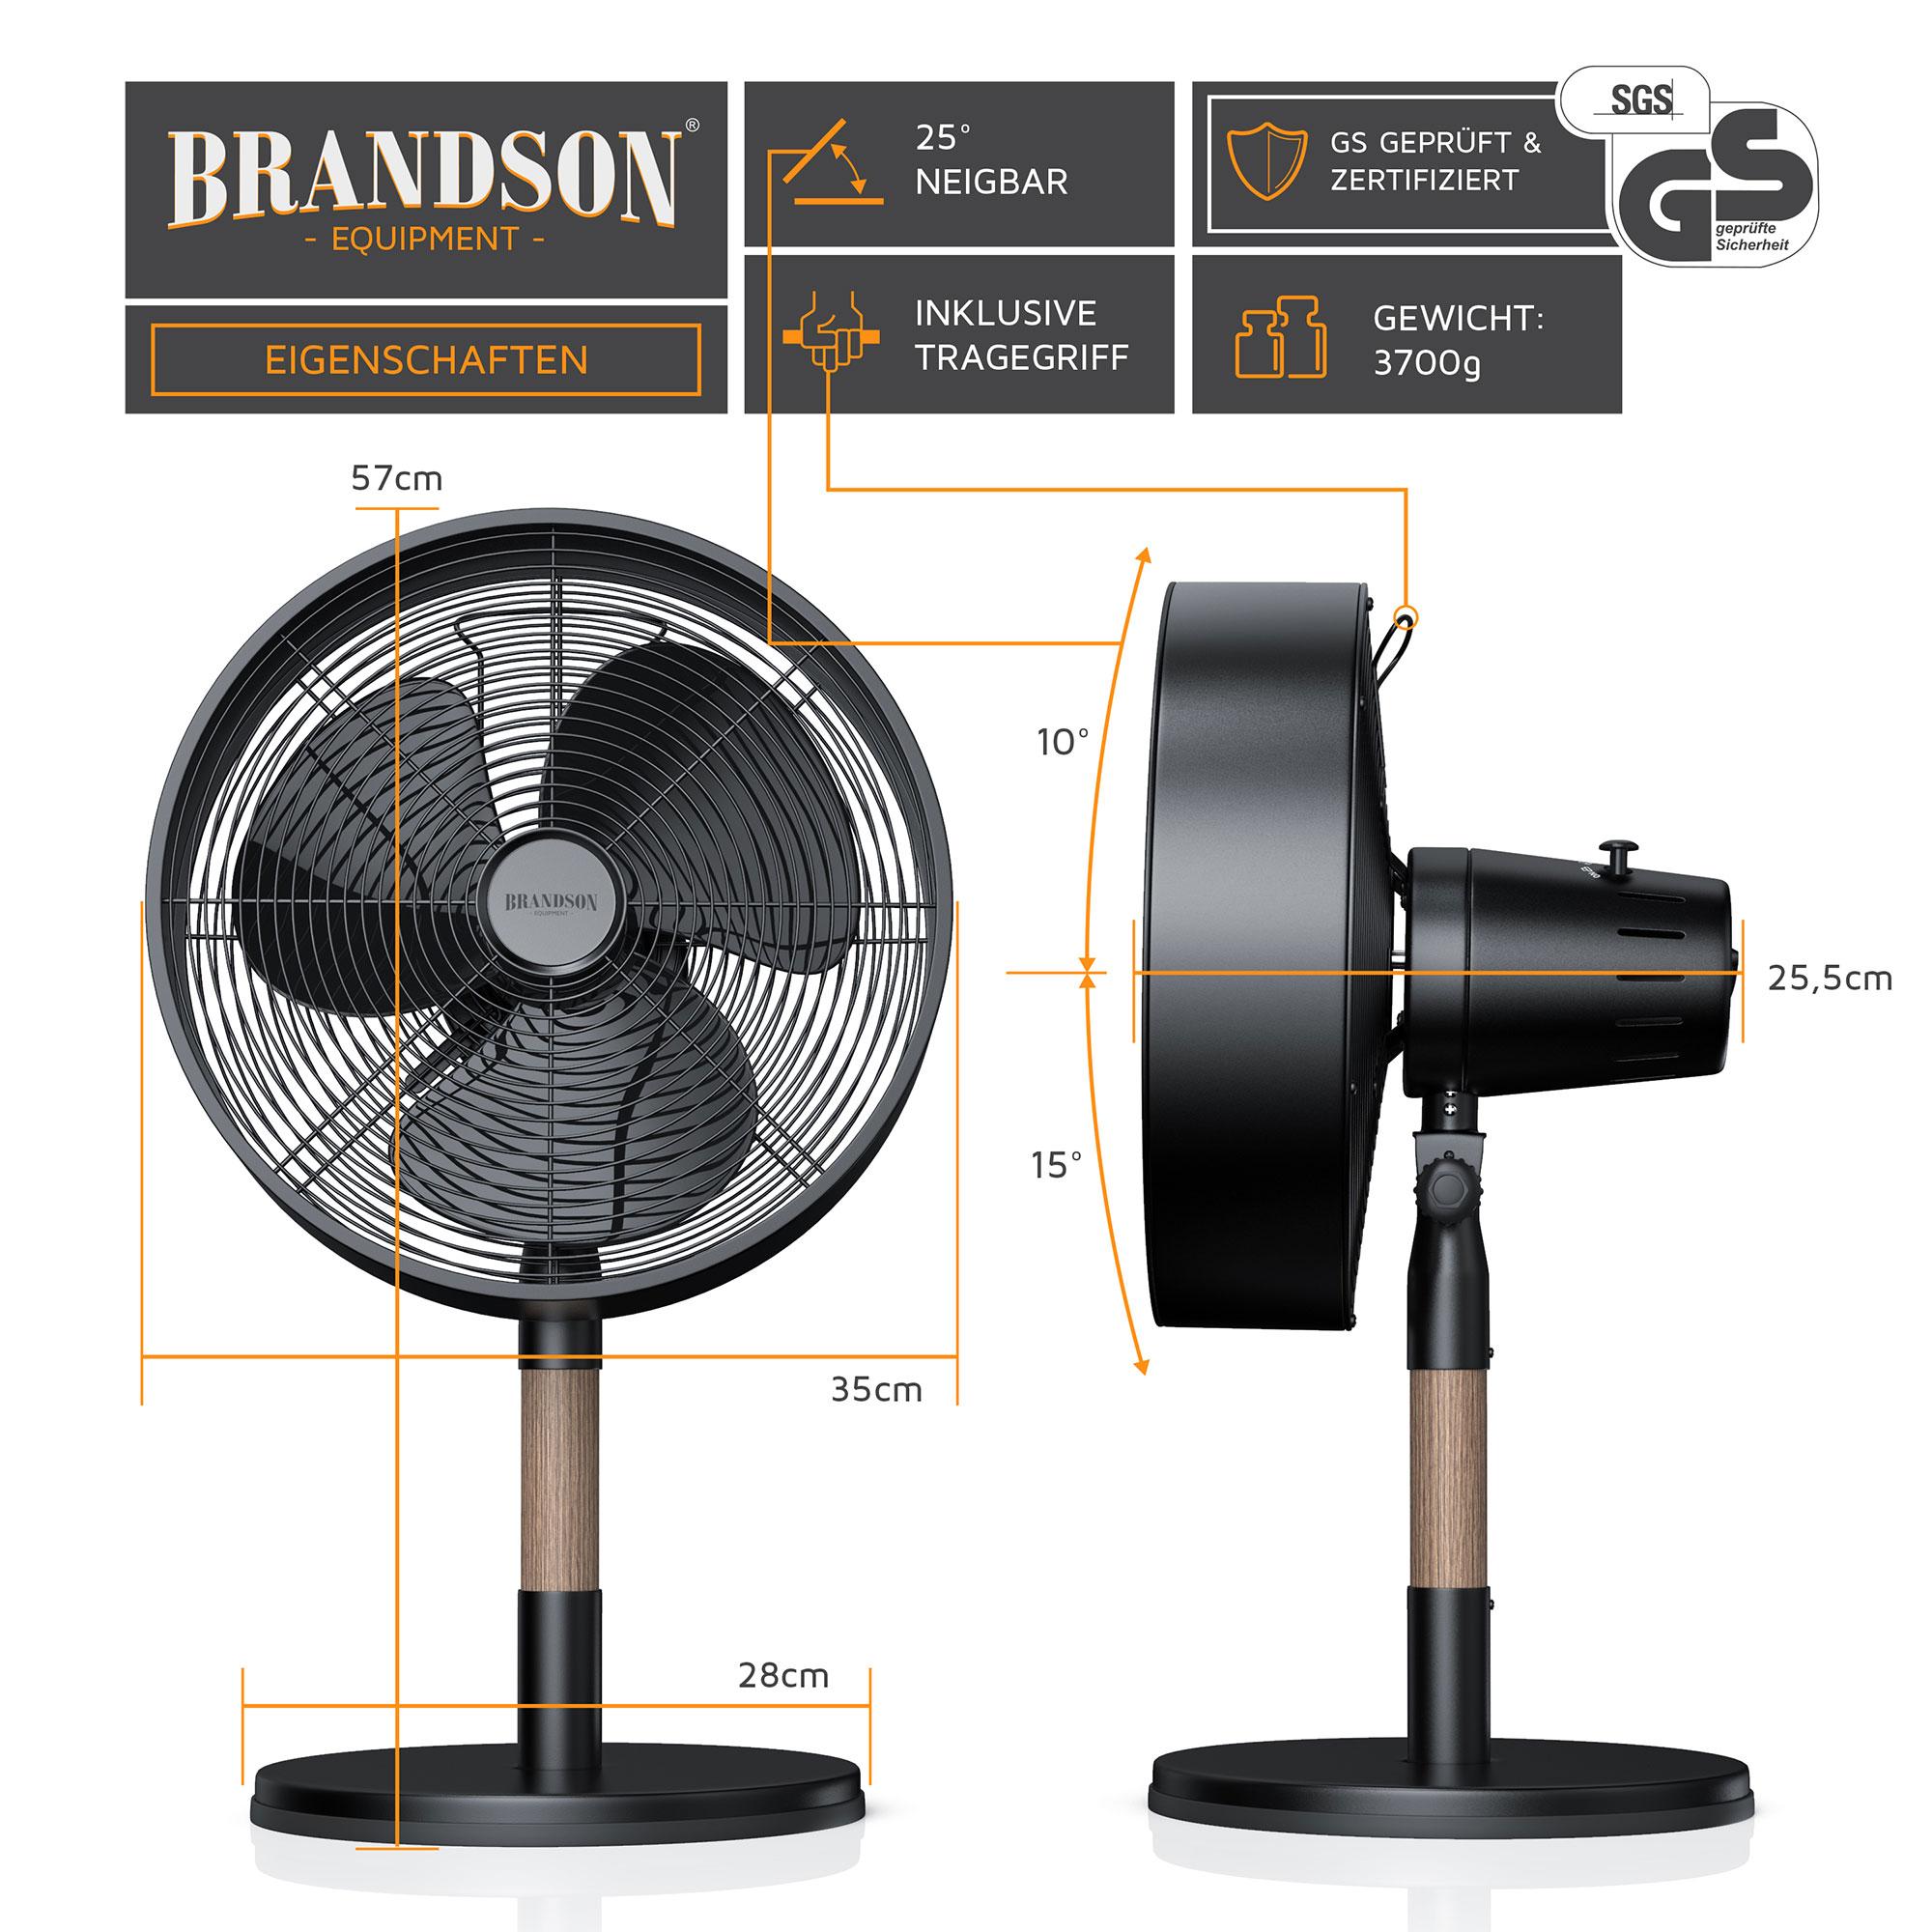 303055-Ventilator-Masse.jpg